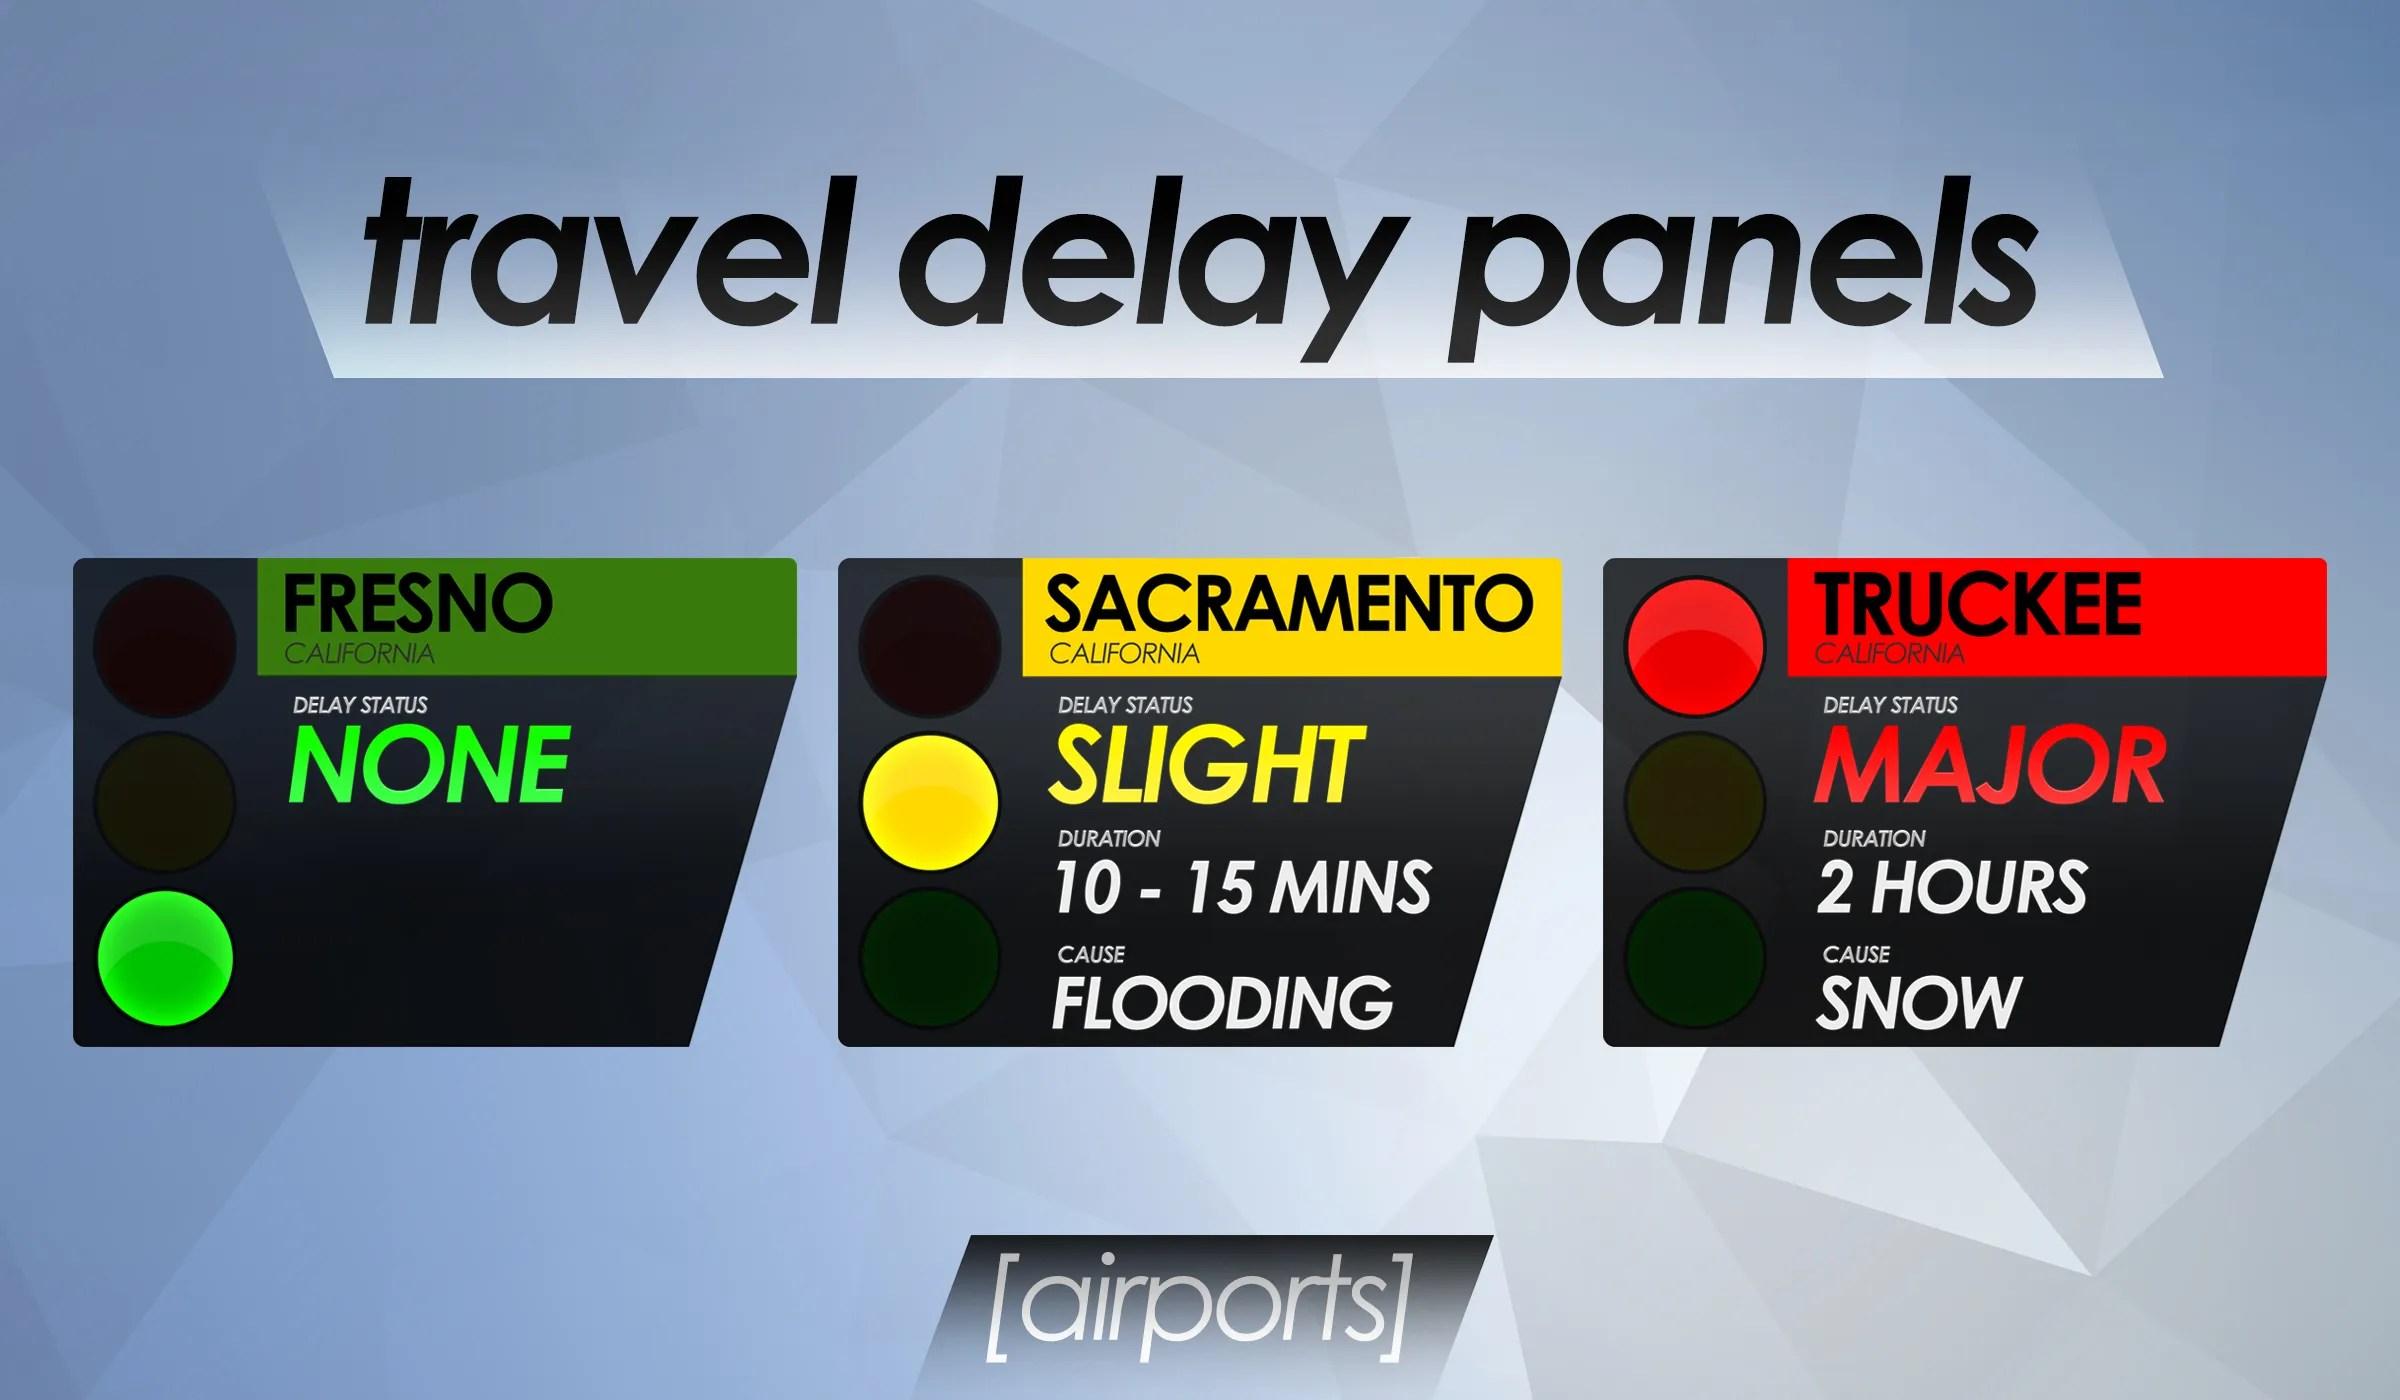 Road Travel Delays